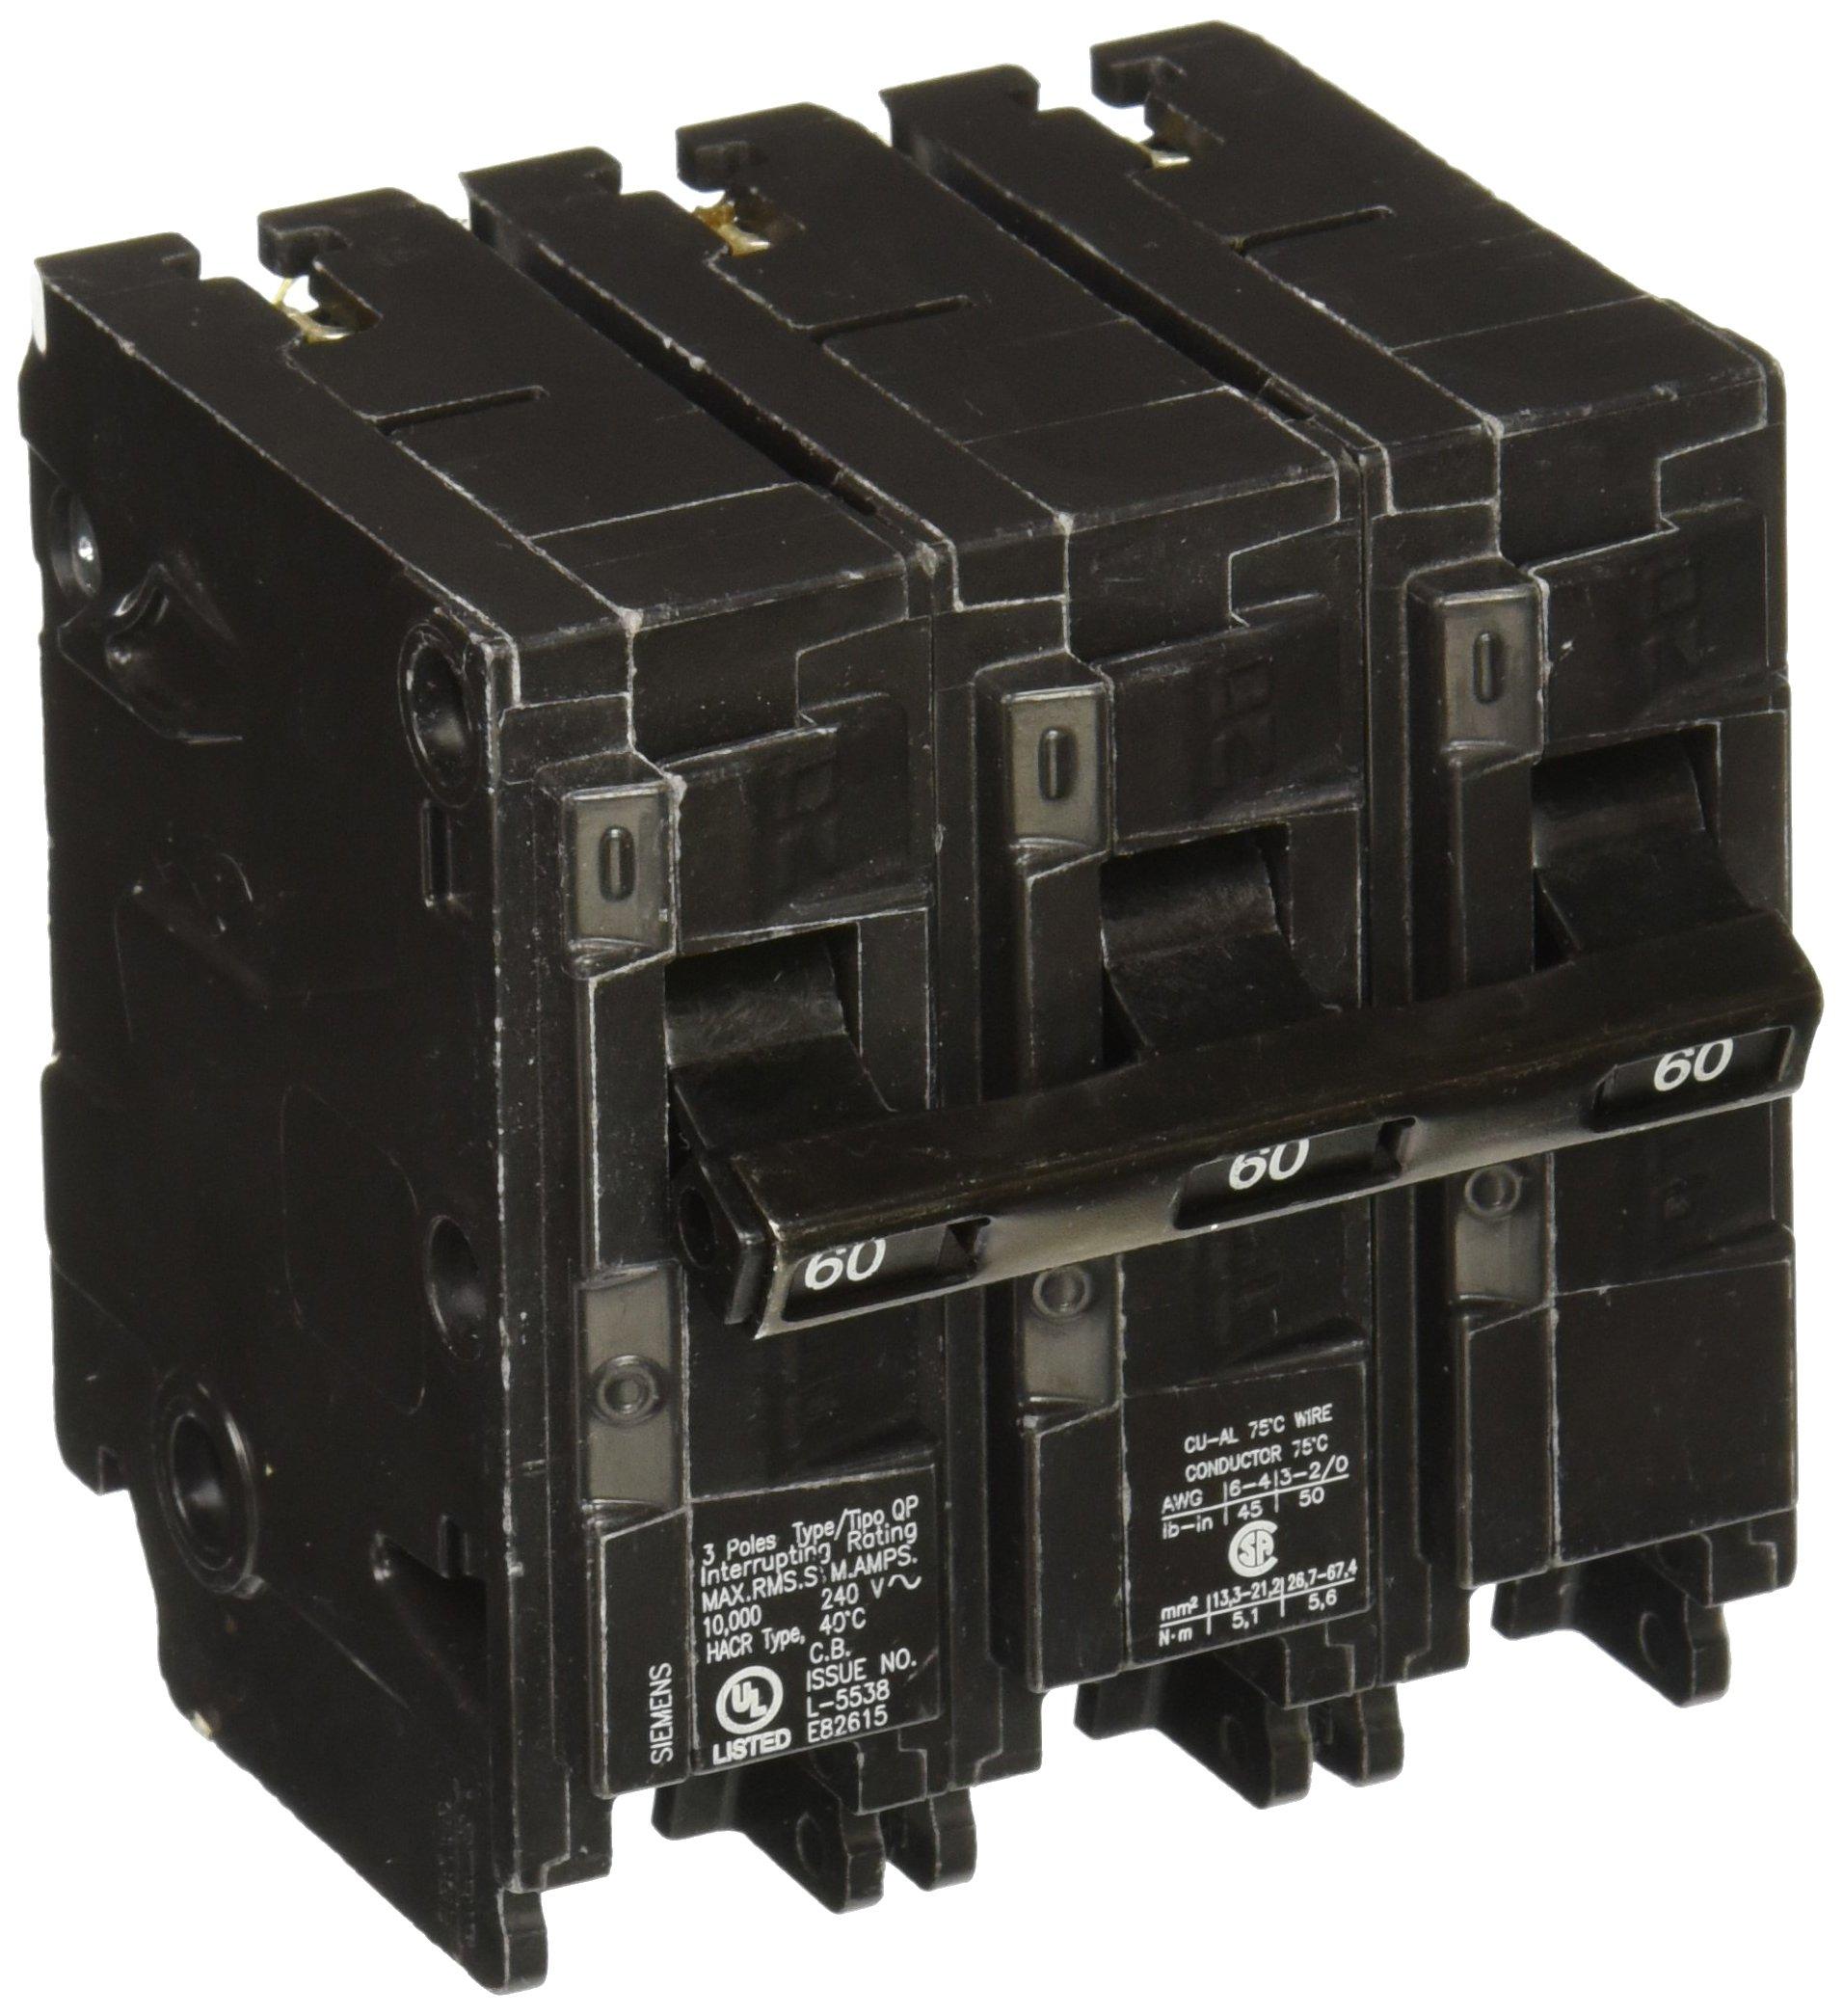 Q360 60-Amp Three Pole Type QP Circuit Breaker by Siemens (Image #1)